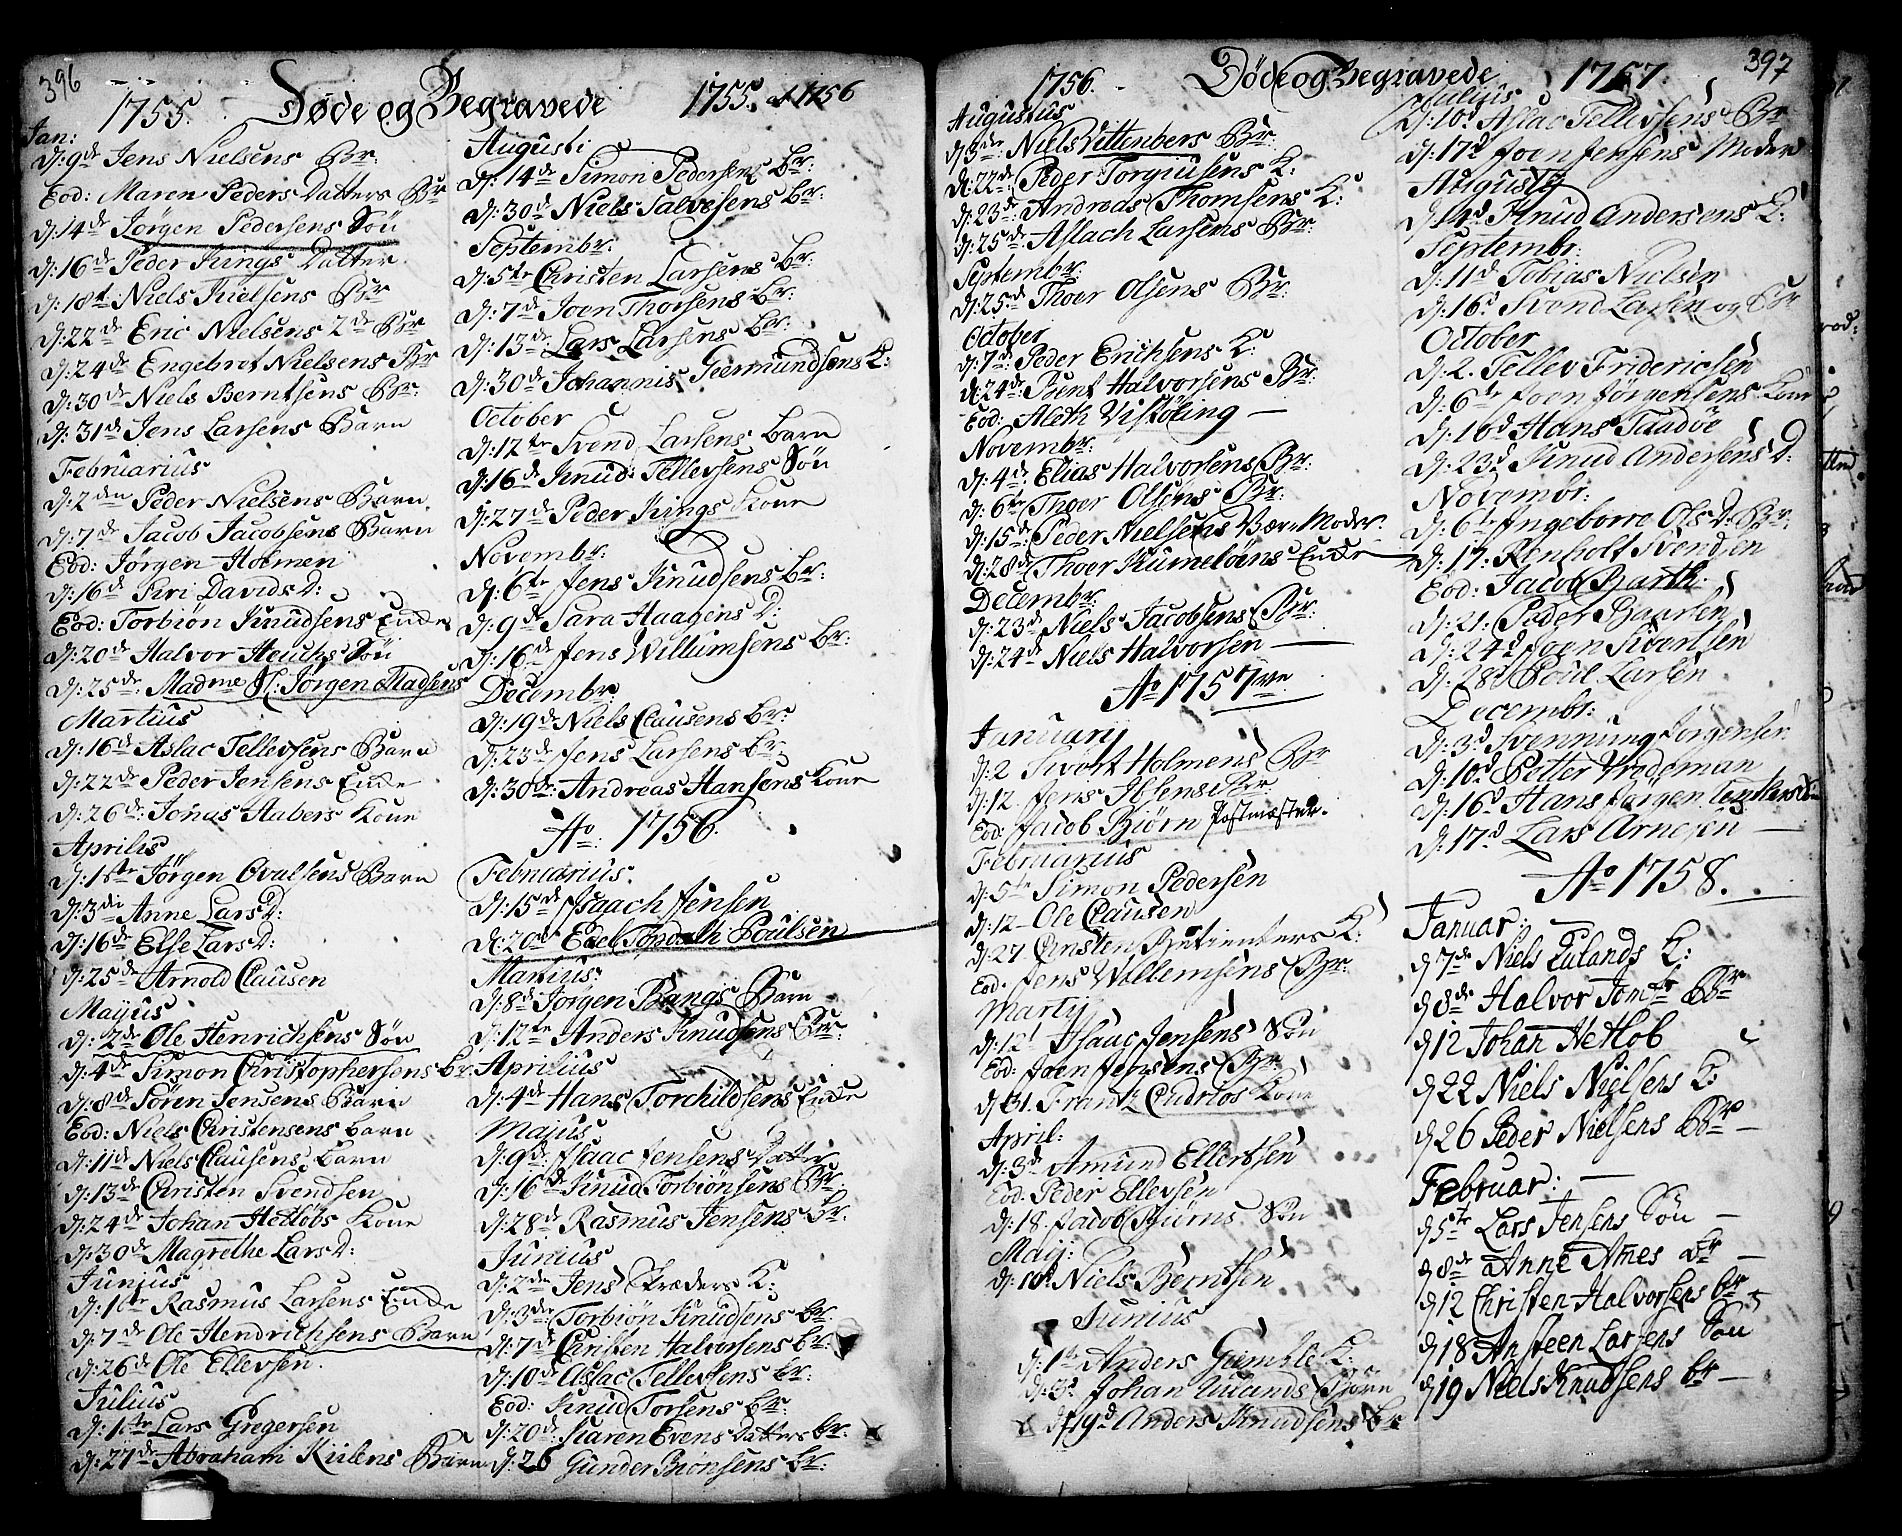 SAKO, Kragerø kirkebøker, F/Fa/L0001: Ministerialbok nr. 1, 1702-1766, s. 396-397